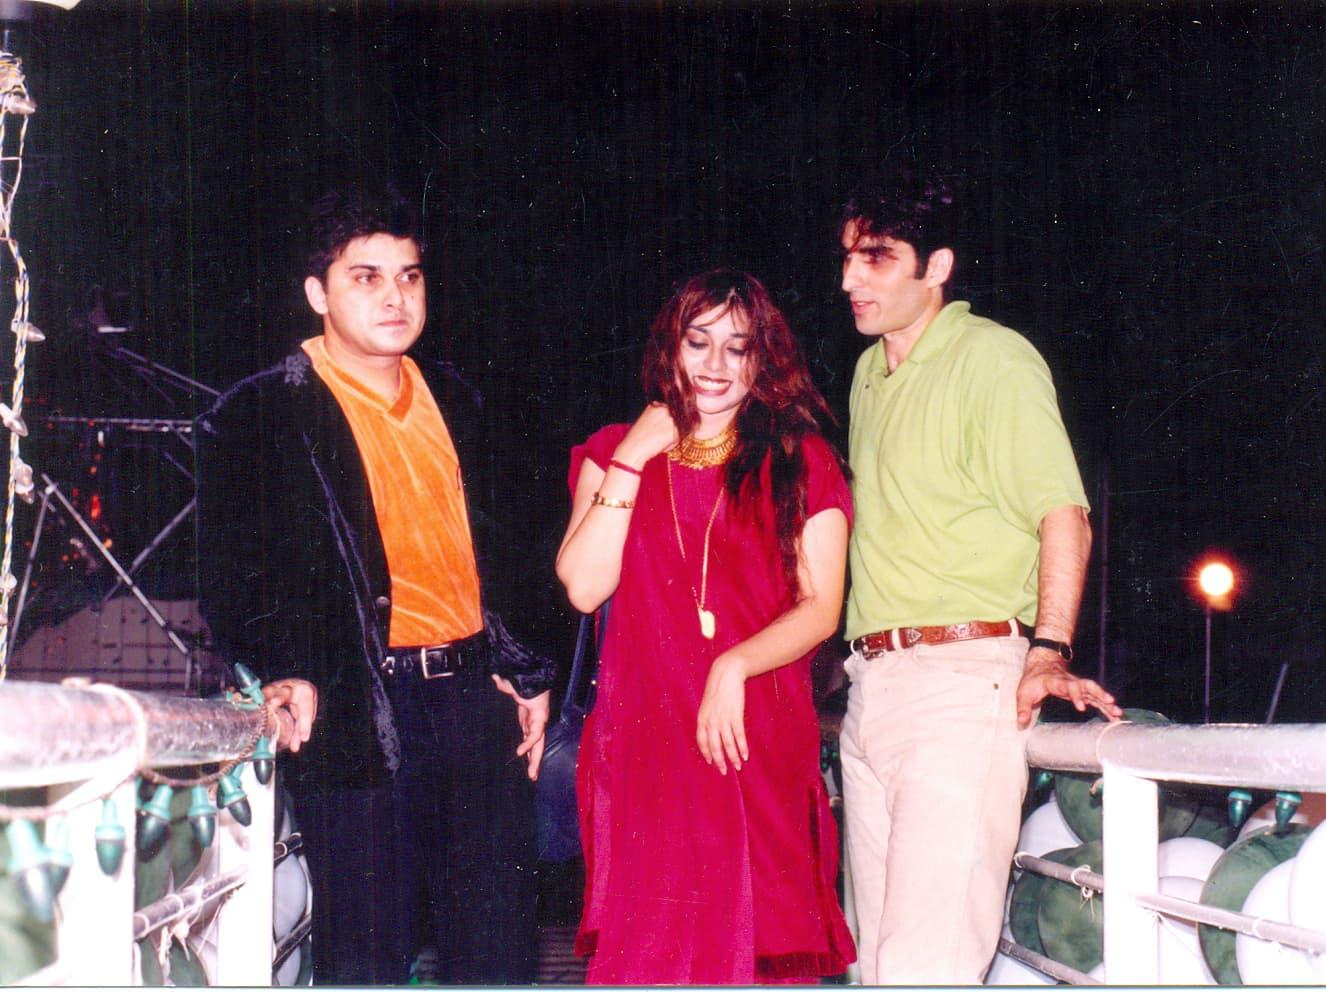 Junaid Jamshed chills with Komal Rizvi and Ali Haider at a NTM concert for Pakistan's 50 anniversary